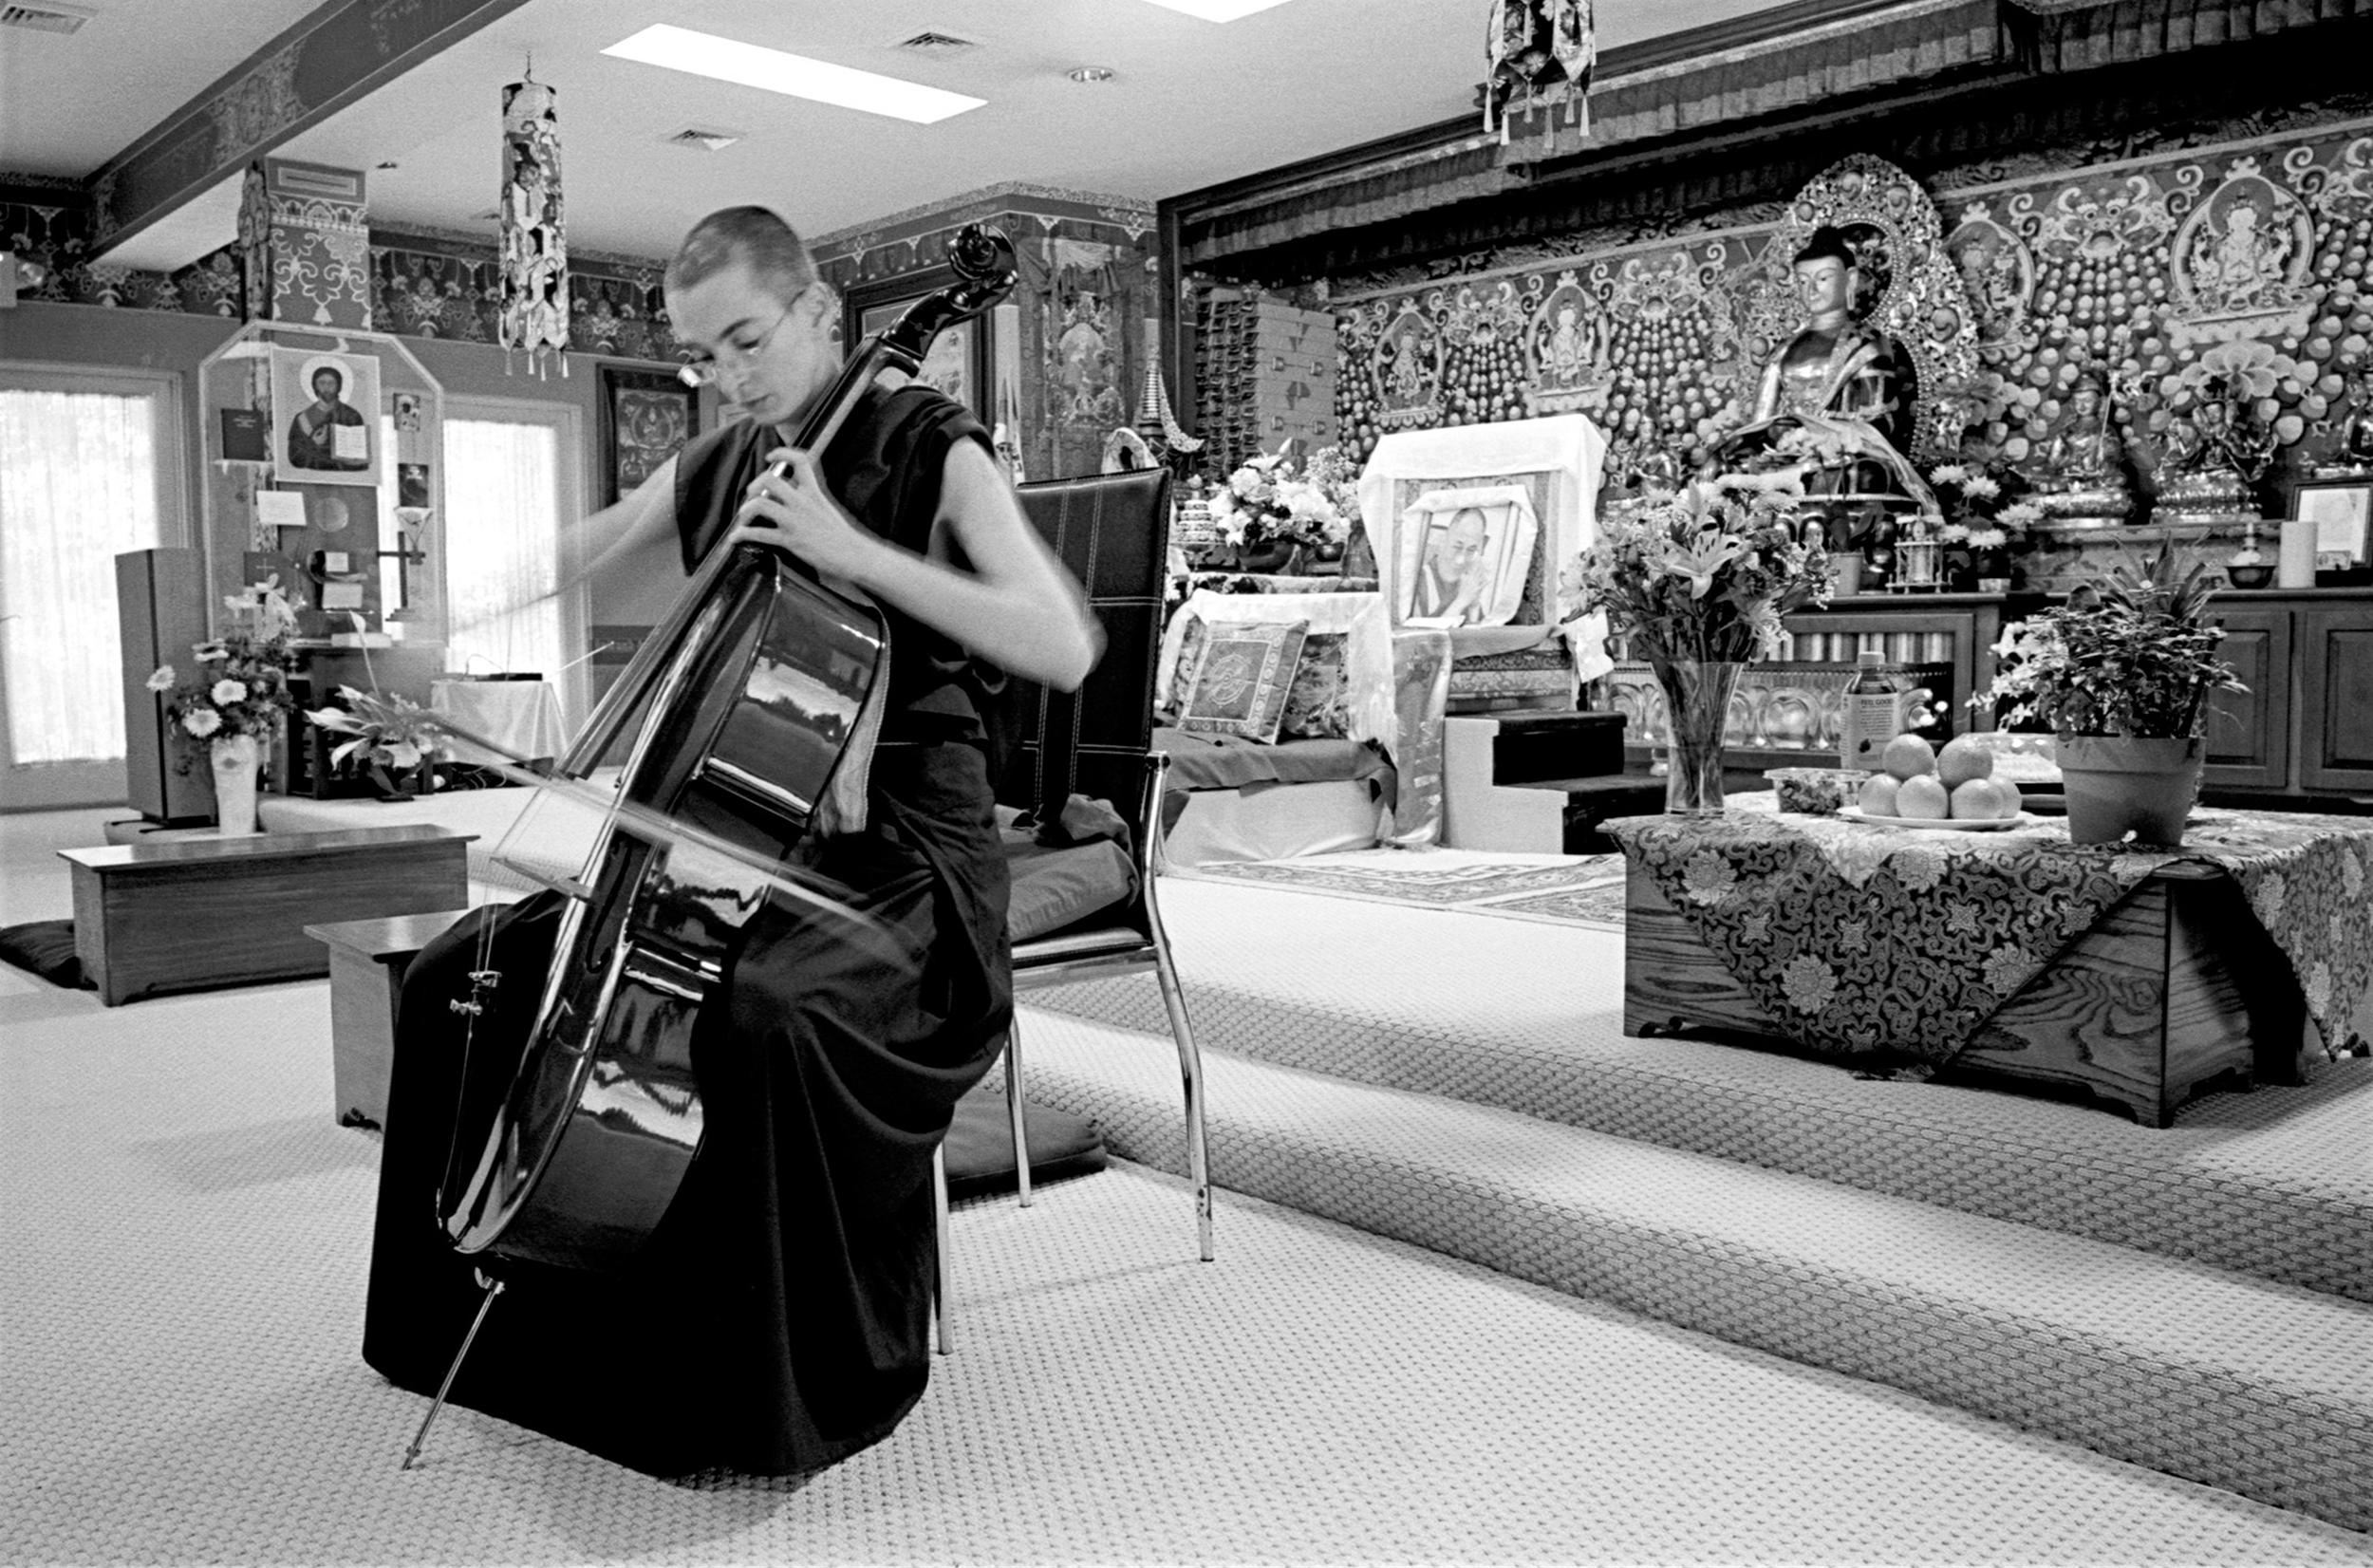 Buddhist nun Ani Choekyi gives a classical cello recital